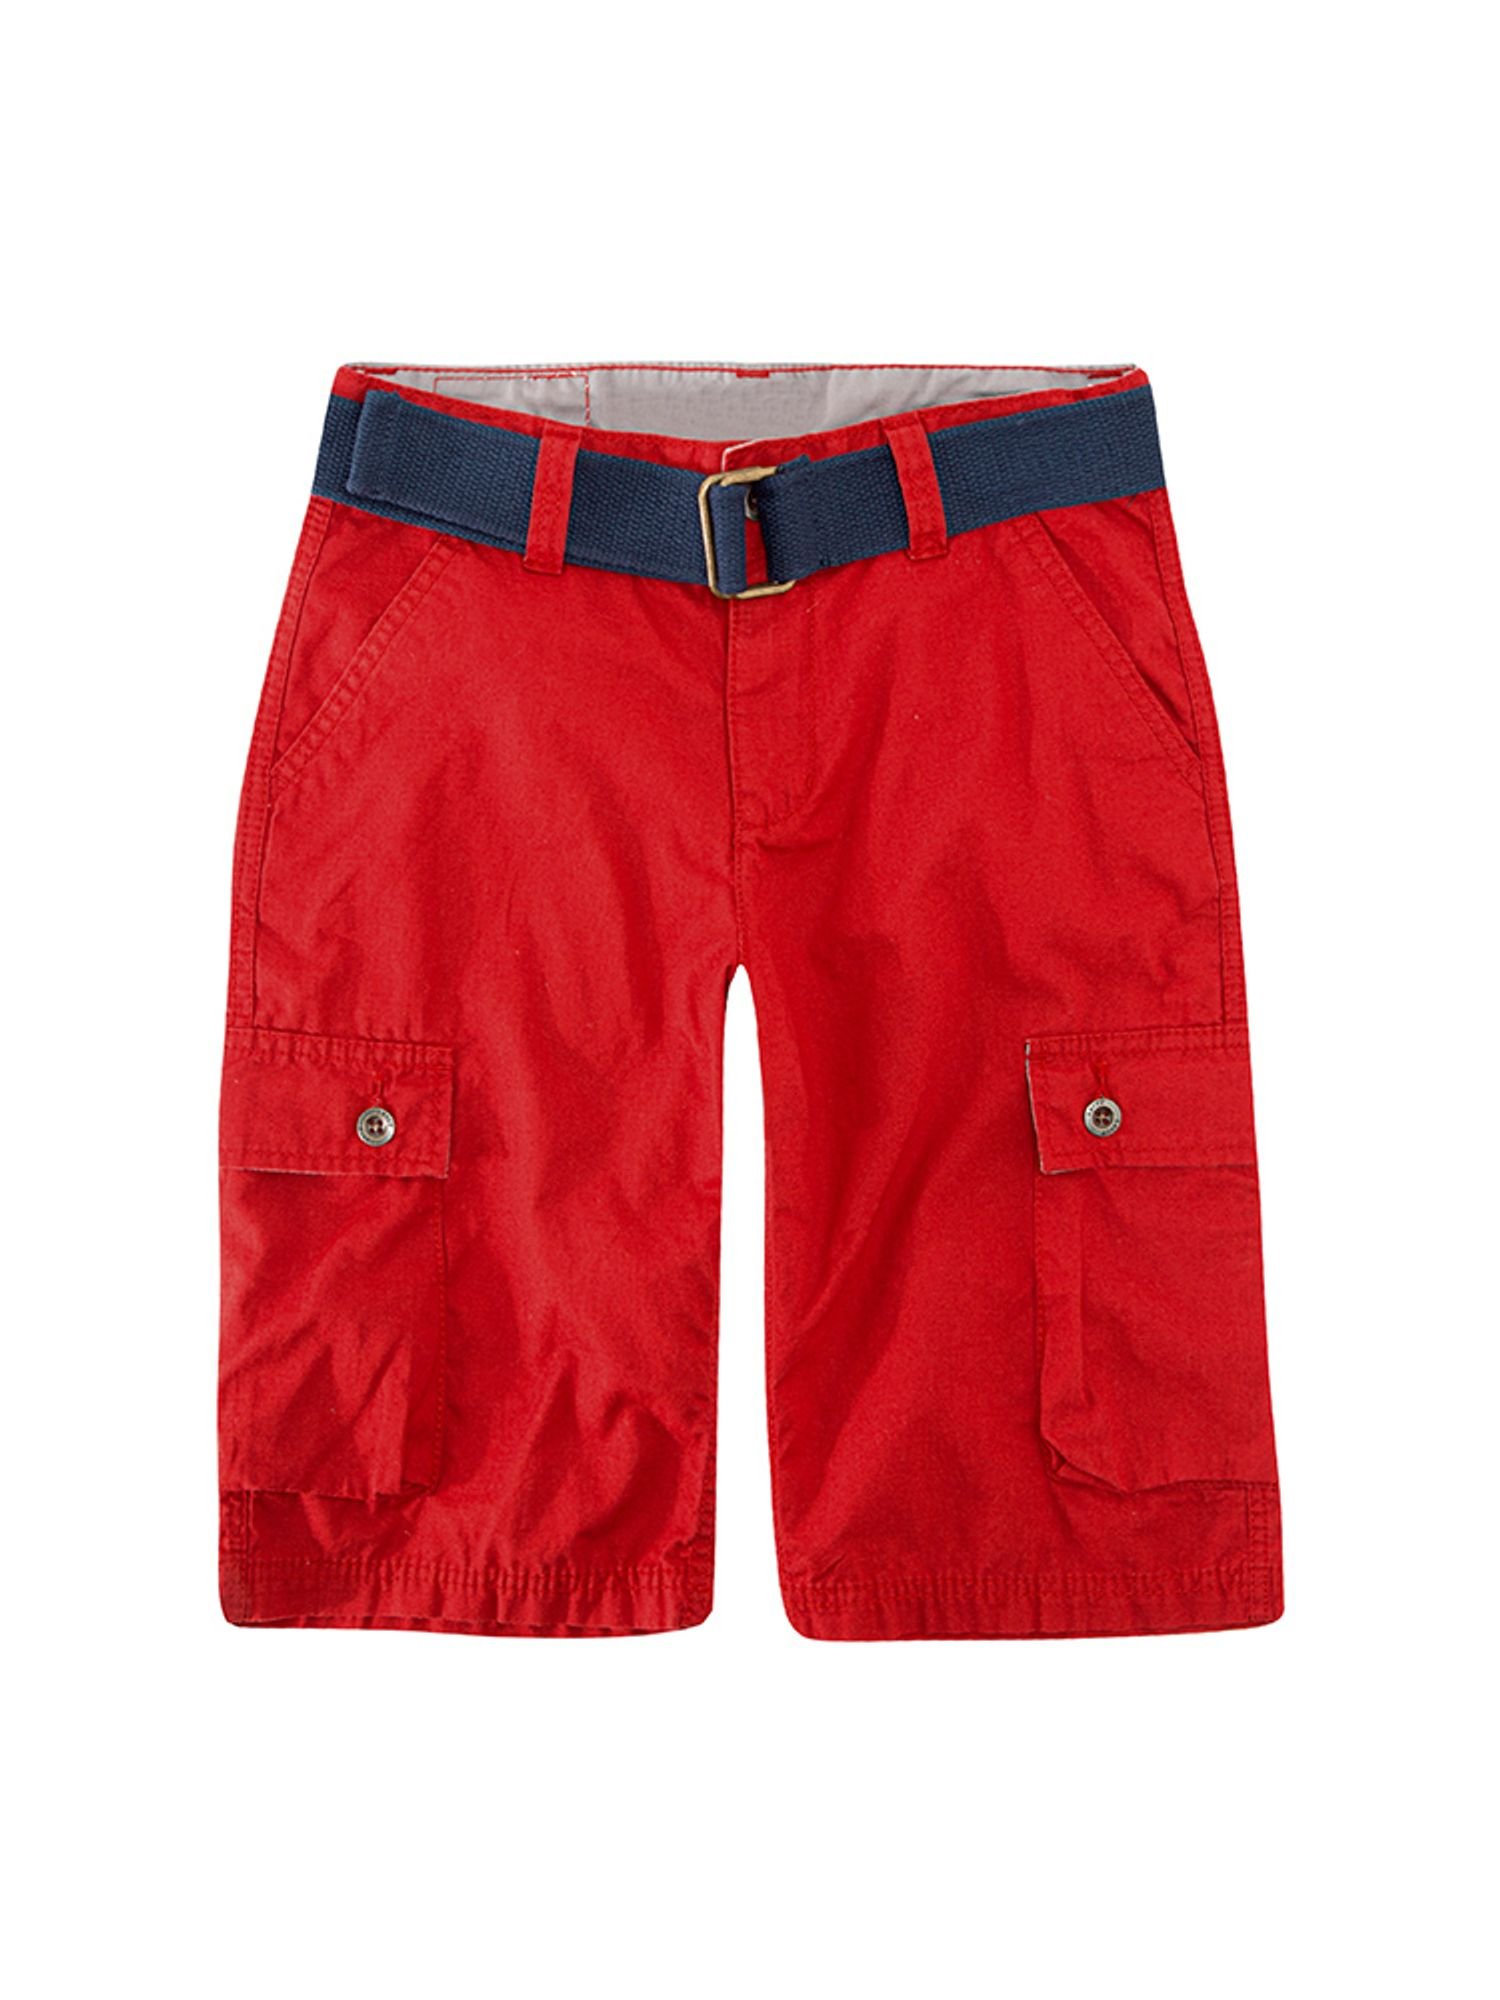 Short_Westwood_Cargo_Pompeian_Red_-8-16_años-_1